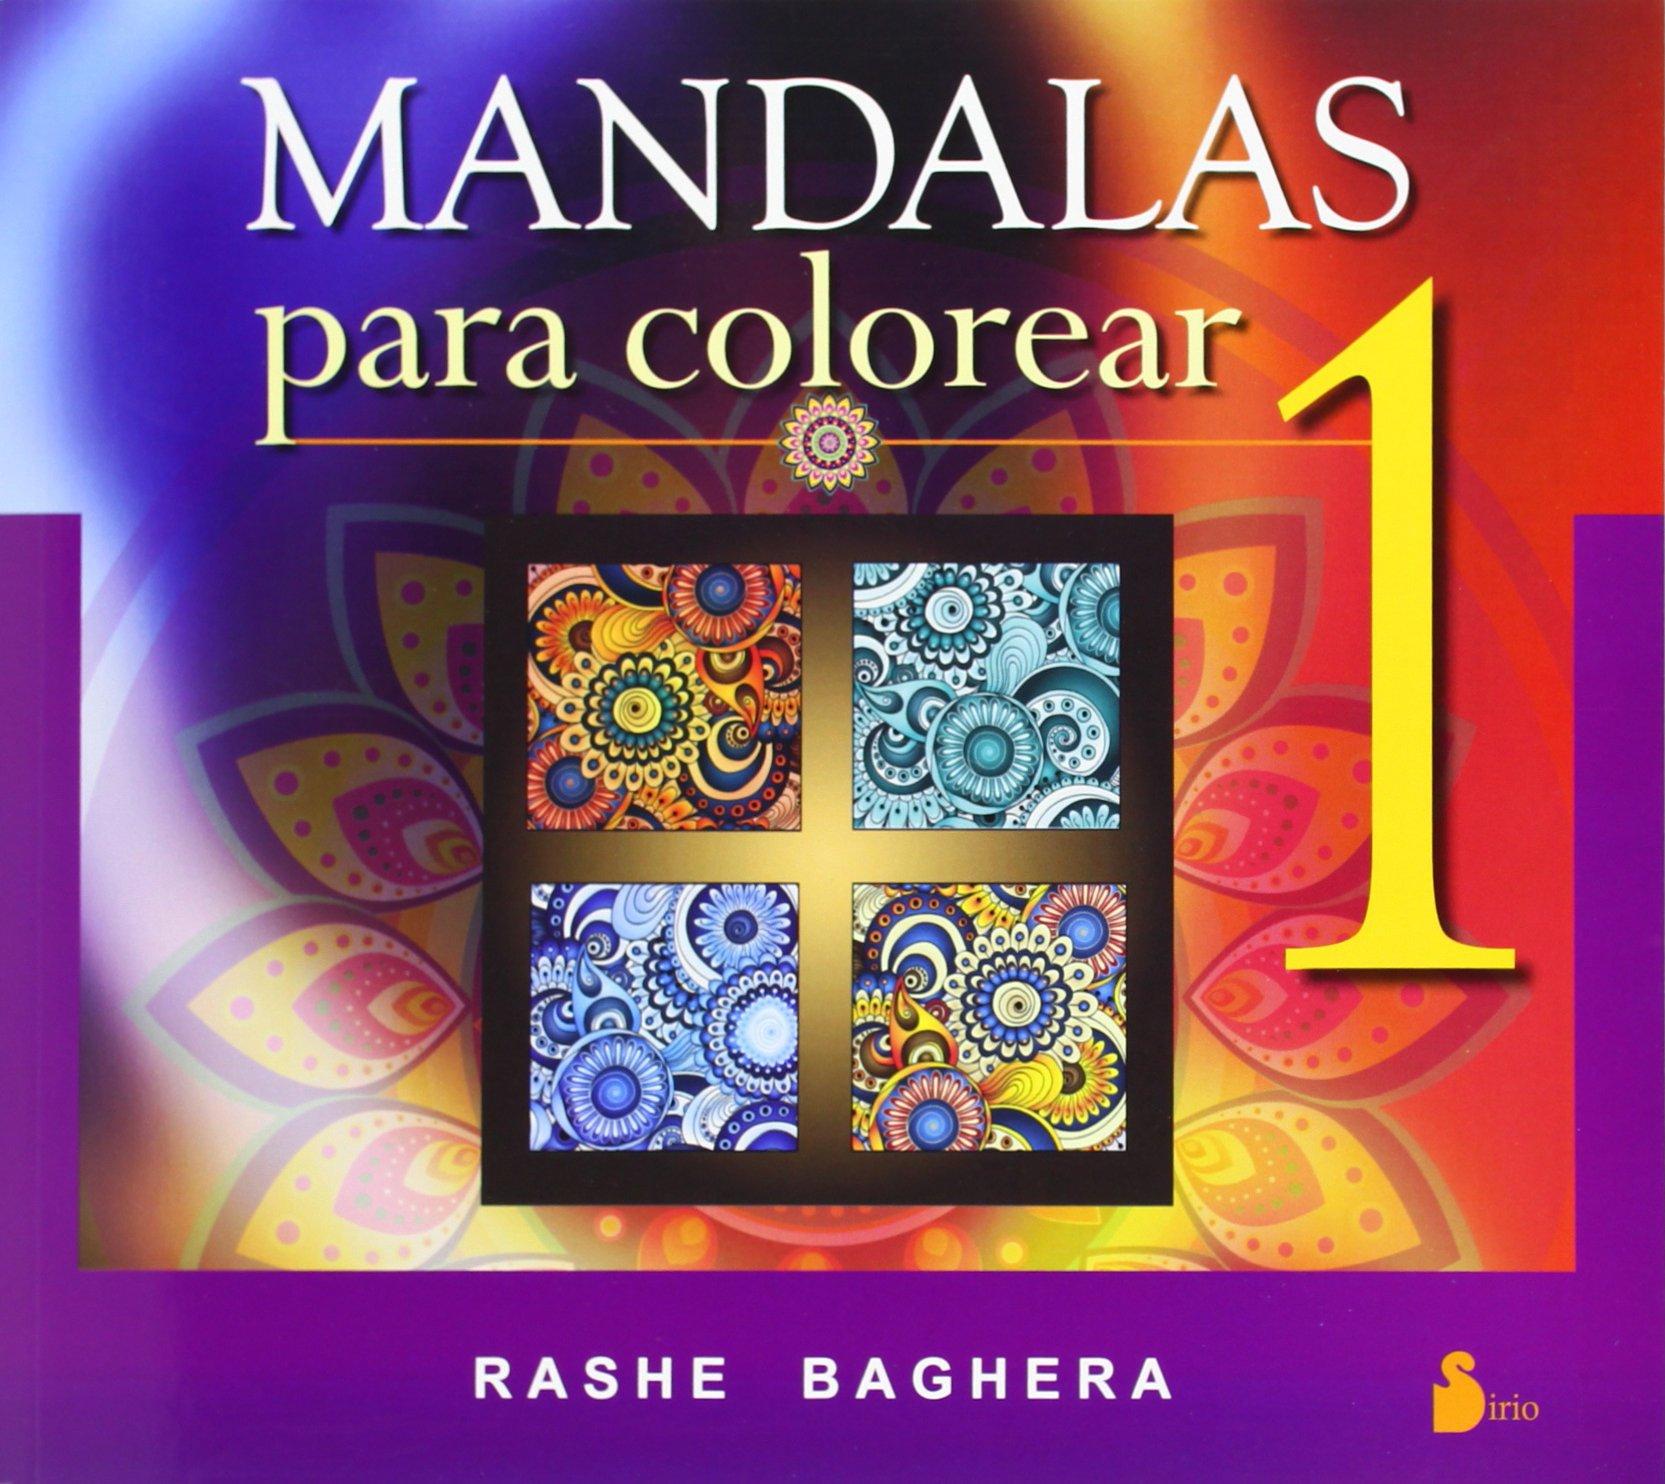 MANDALAS PARA COLOREAR. 1 (2014) Tapa blanda – 7 abr 2014 RASHE BAGUERA S.A. EDITORIAL SIRIO 8478089764 General